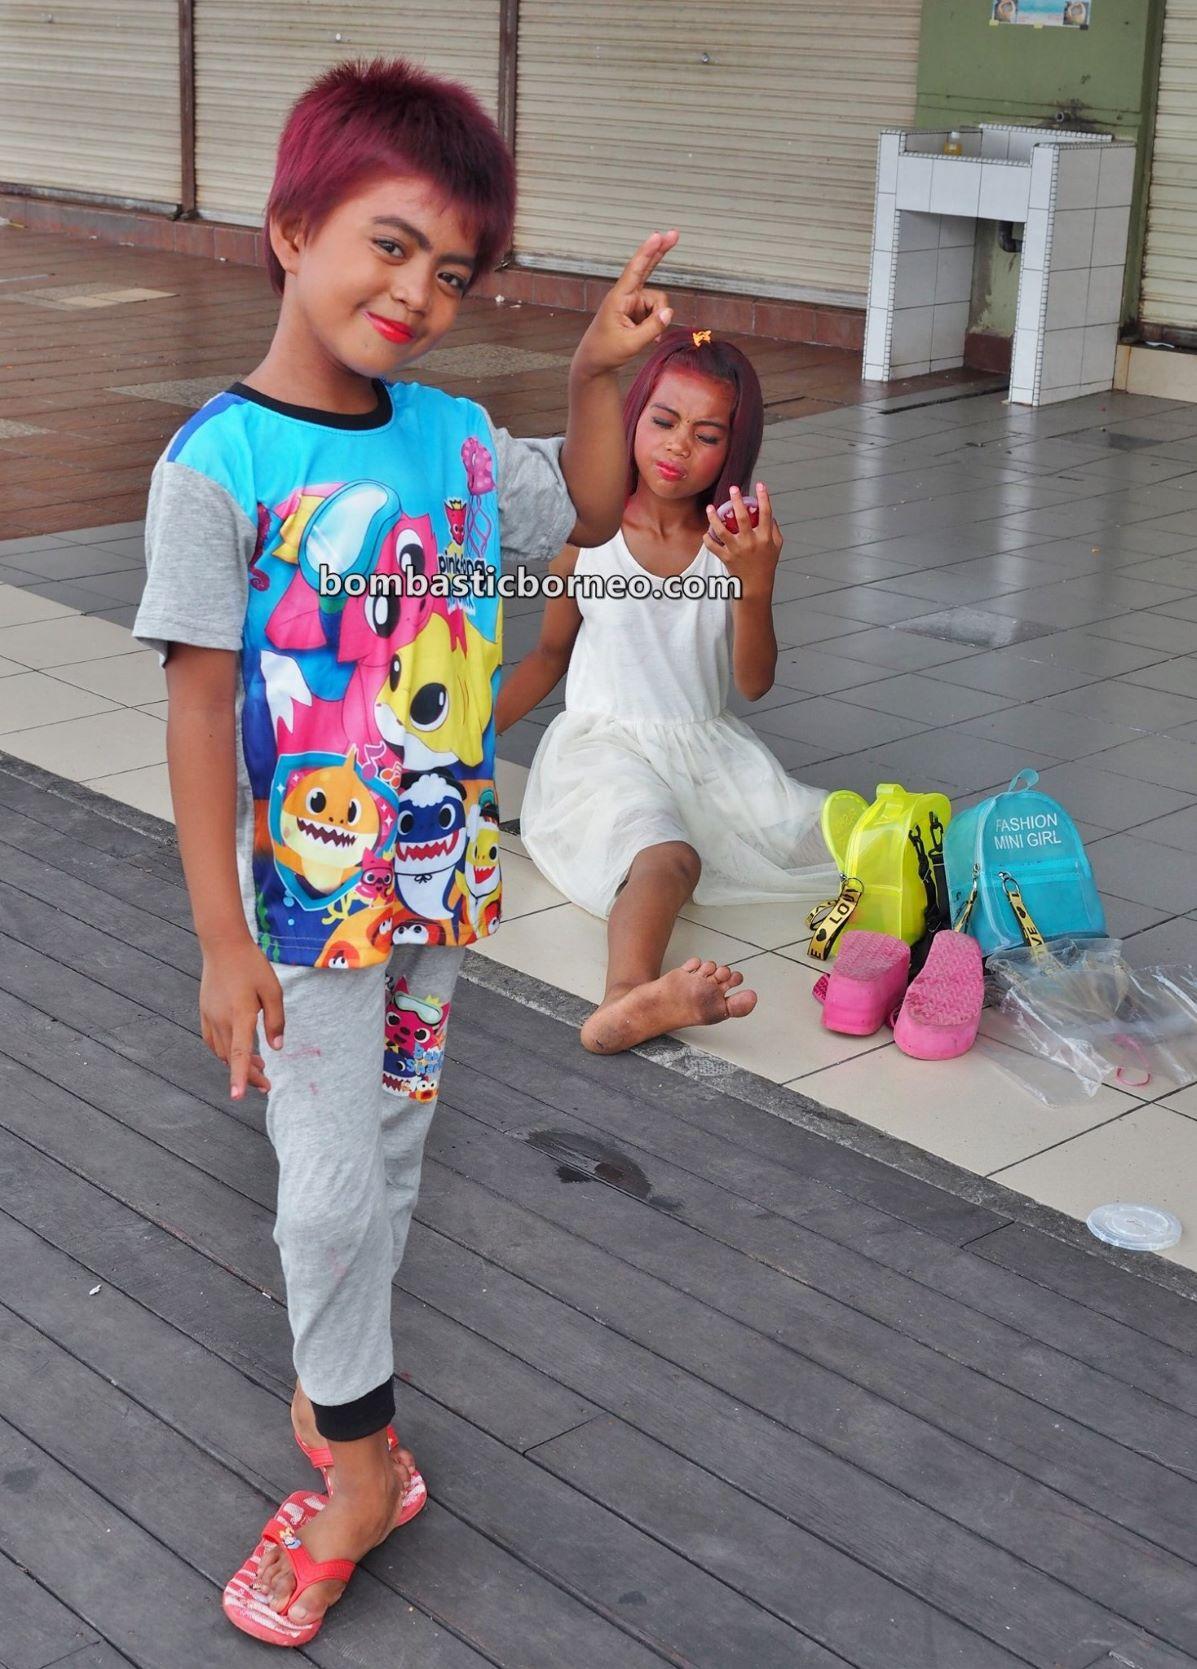 Sea Gypsies, Pesta Regatta Lepa, Water Festival, backpackers, destination, Suku Bajau Laut, Tourism, tourist attraction, travel guide, 婆罗洲游踪, 马来西亚沙巴斗湖, 仙本那巴瑶民族